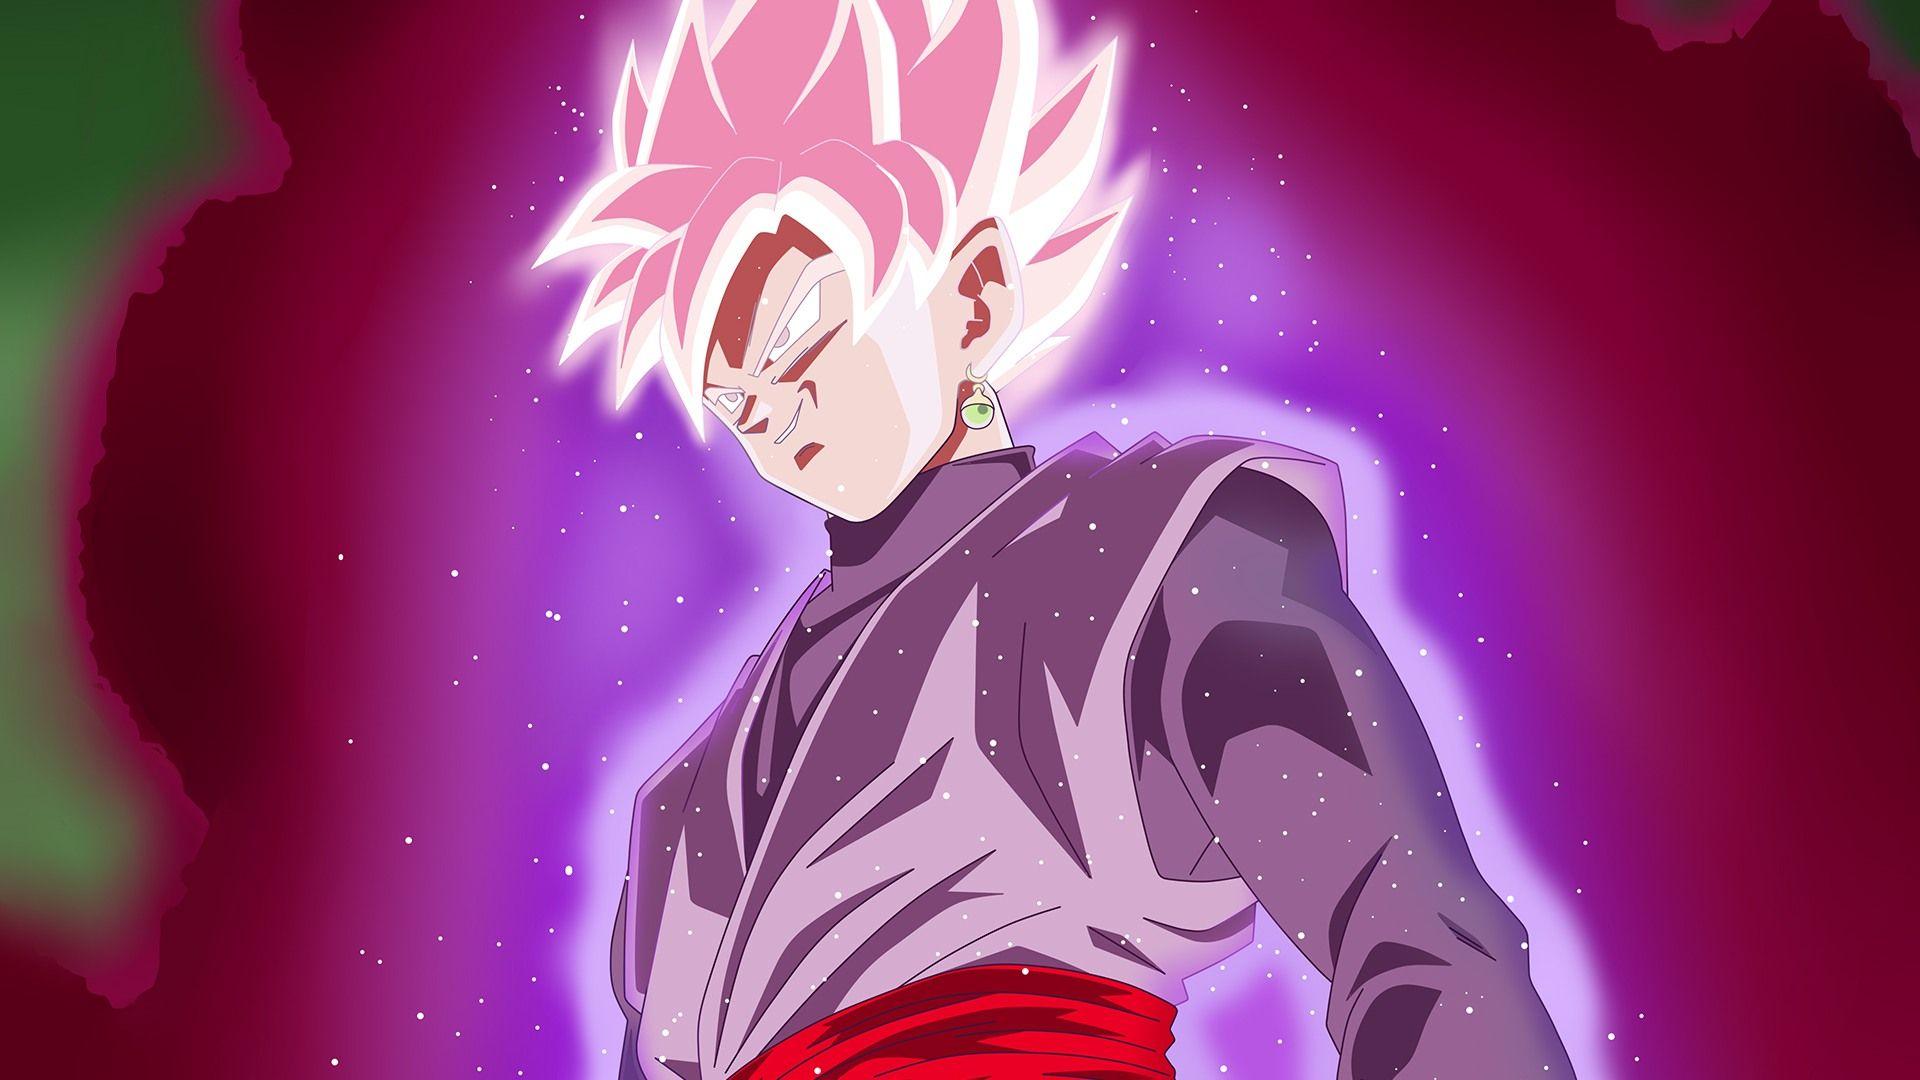 Goku Black Super Saiyan Rose Dragon Ball Super Anime 12033 Super Saiyan Rose Goku Black Super Saiyan Goku Black